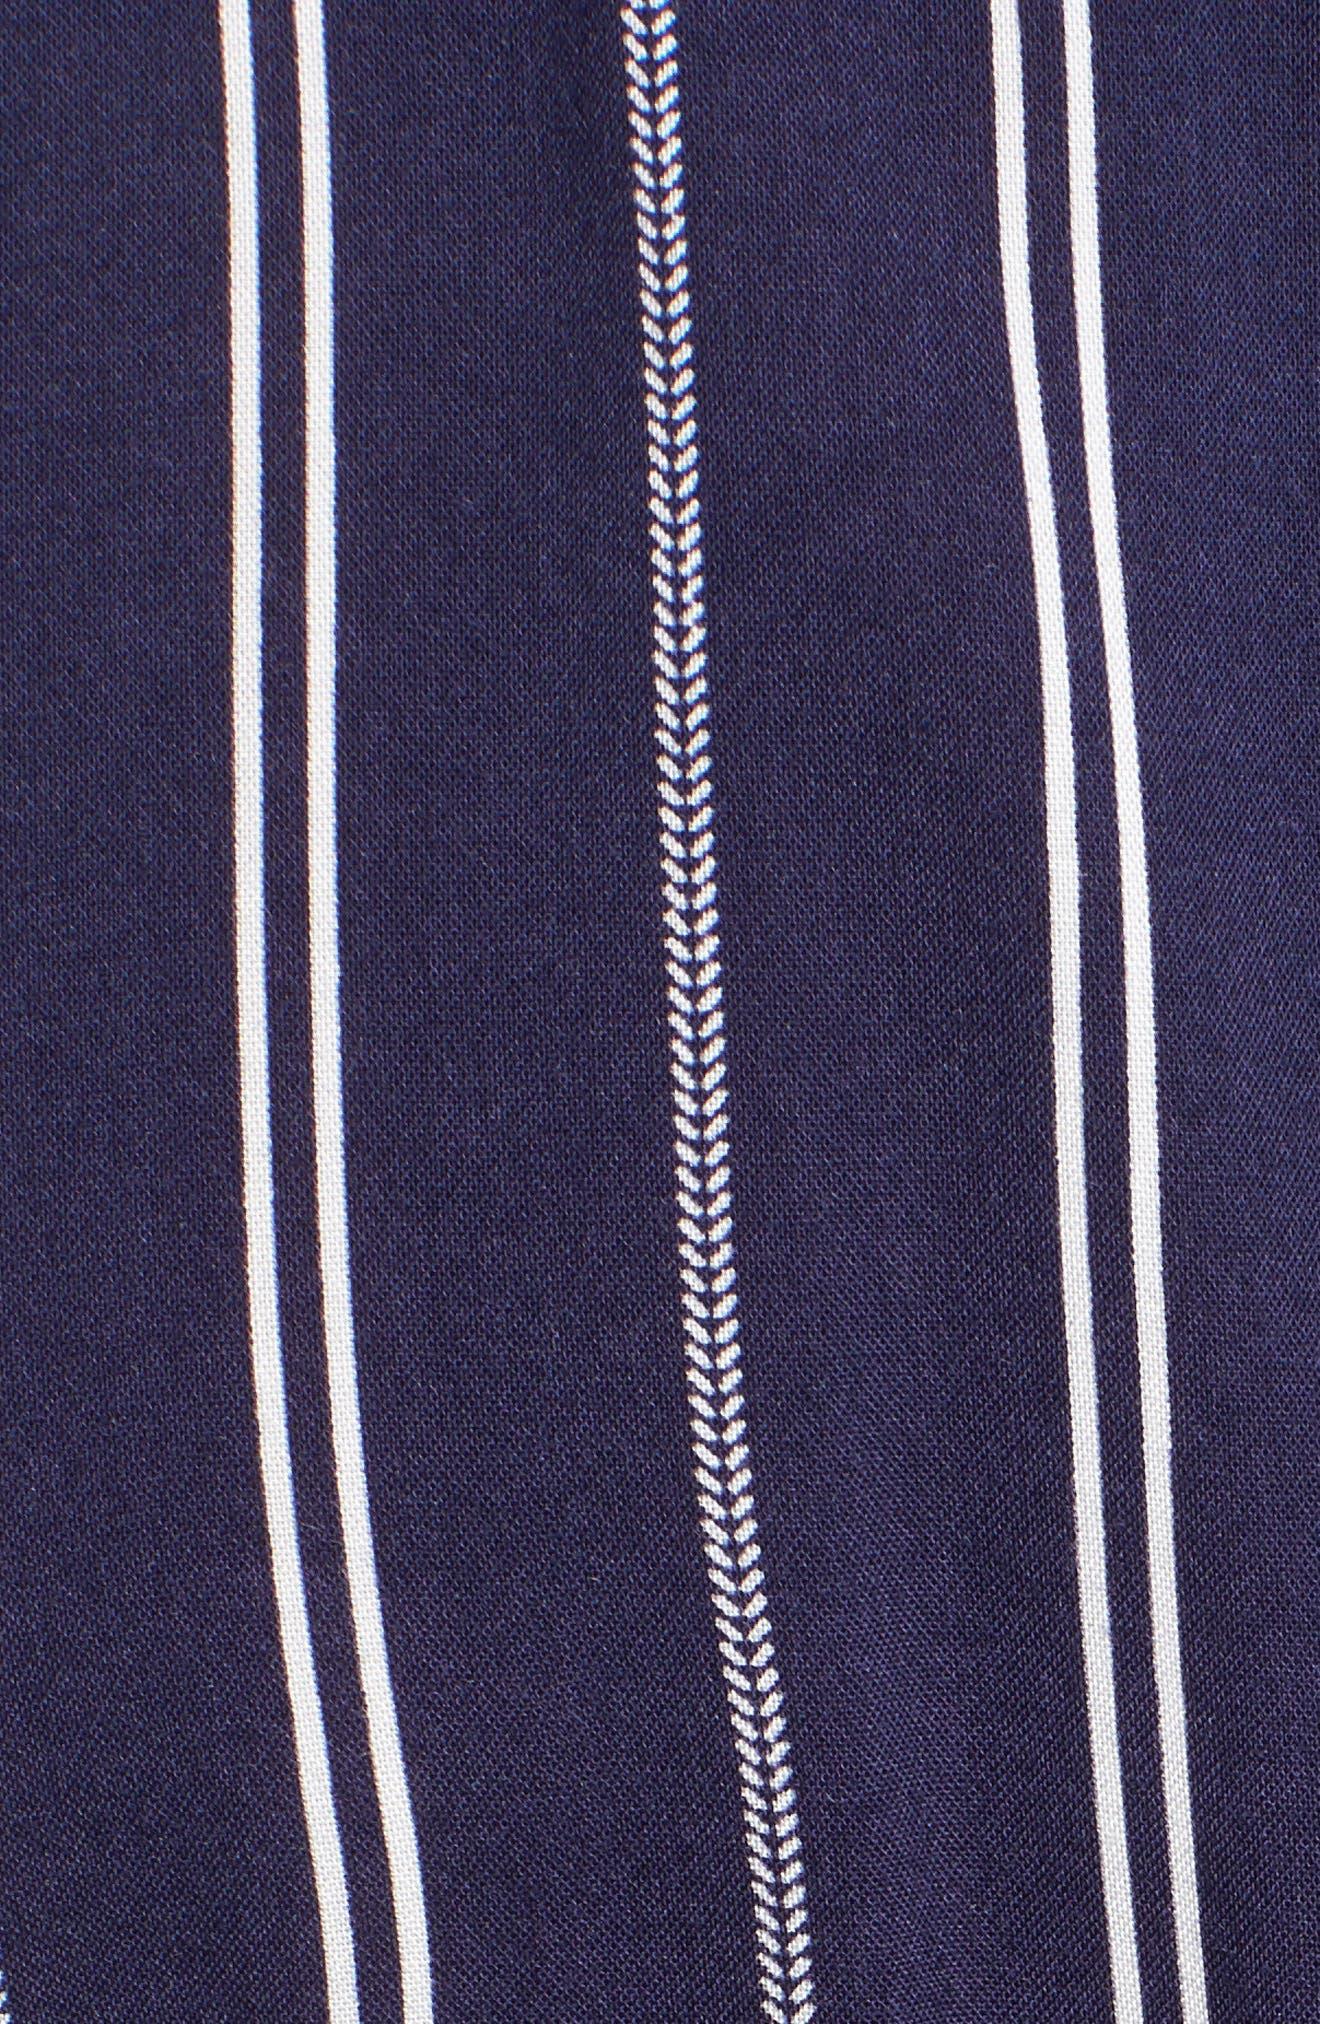 Stripe Side Tie Jumpsuit,                             Alternate thumbnail 6, color,                             Navy